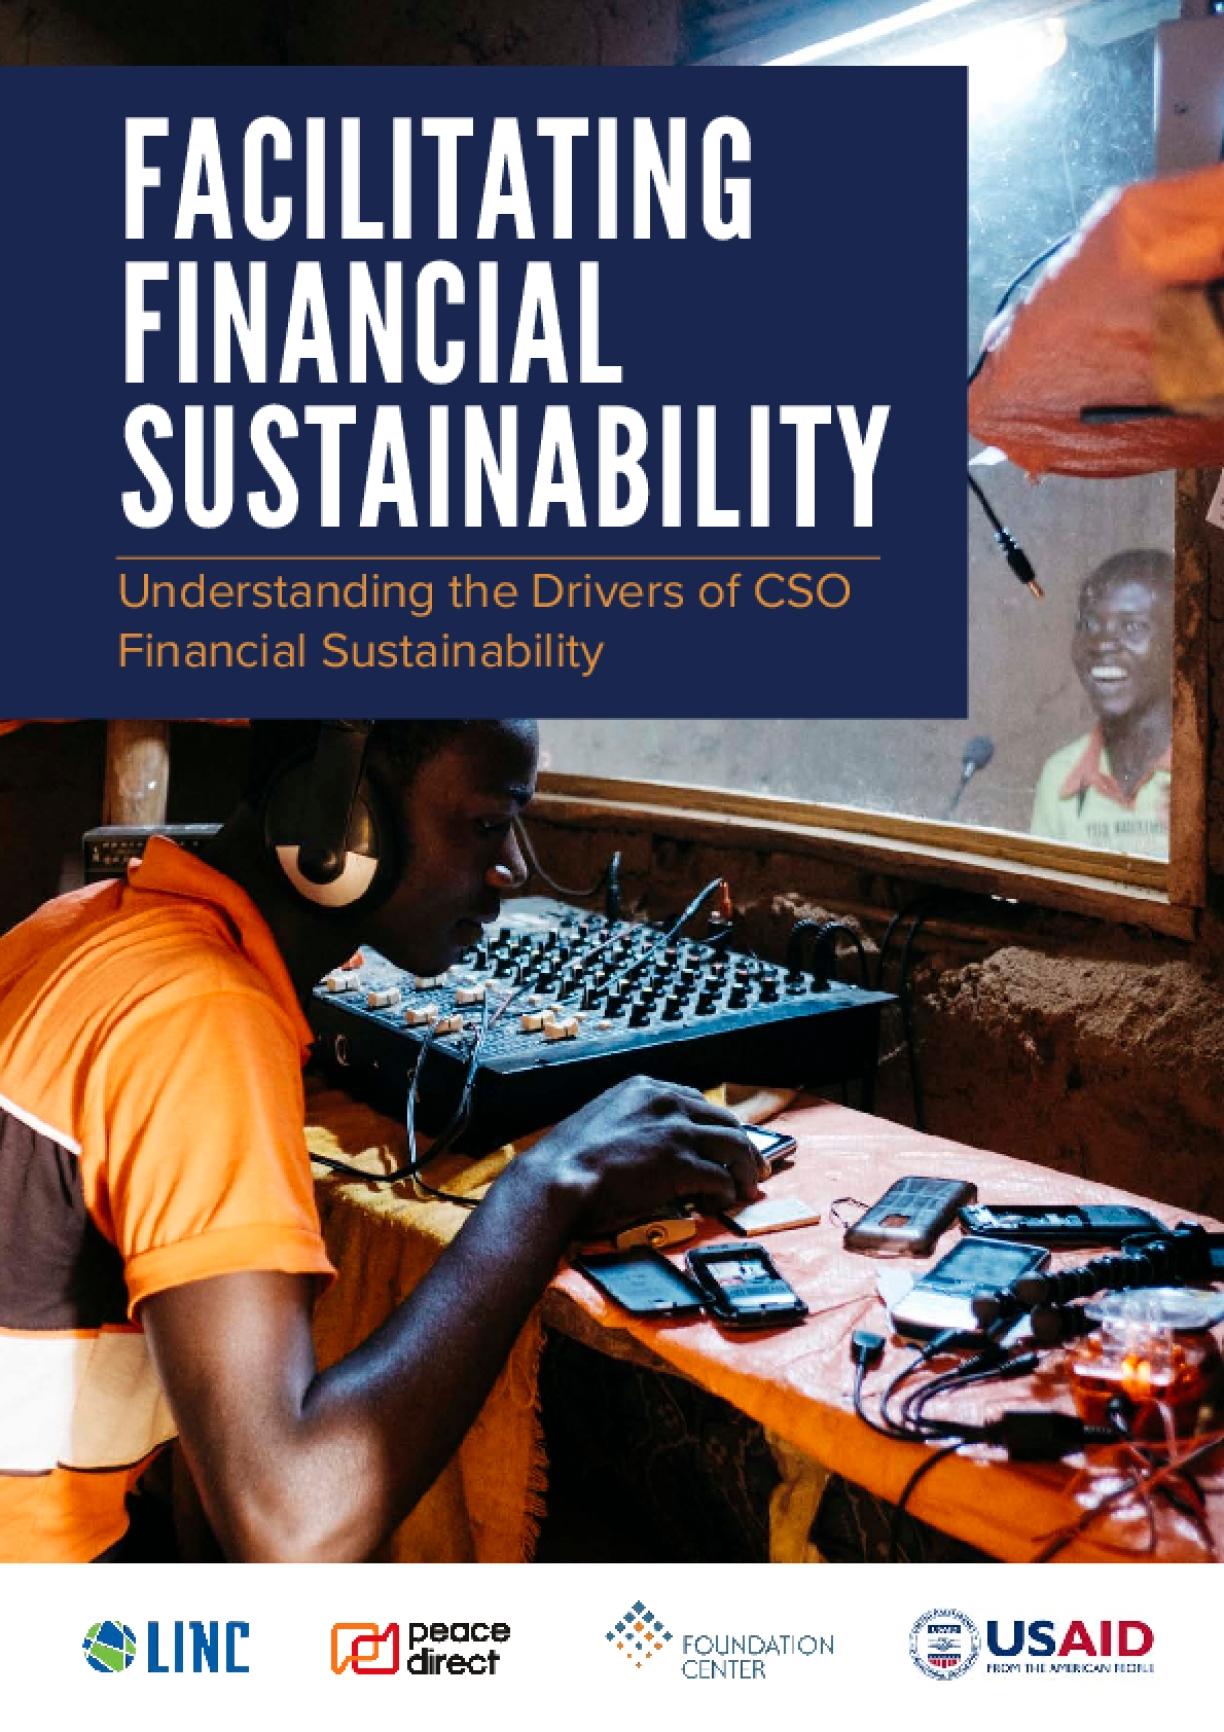 Facilitating Financial Sustainability: Understanding the Drivers of CSO Financial Sustainability